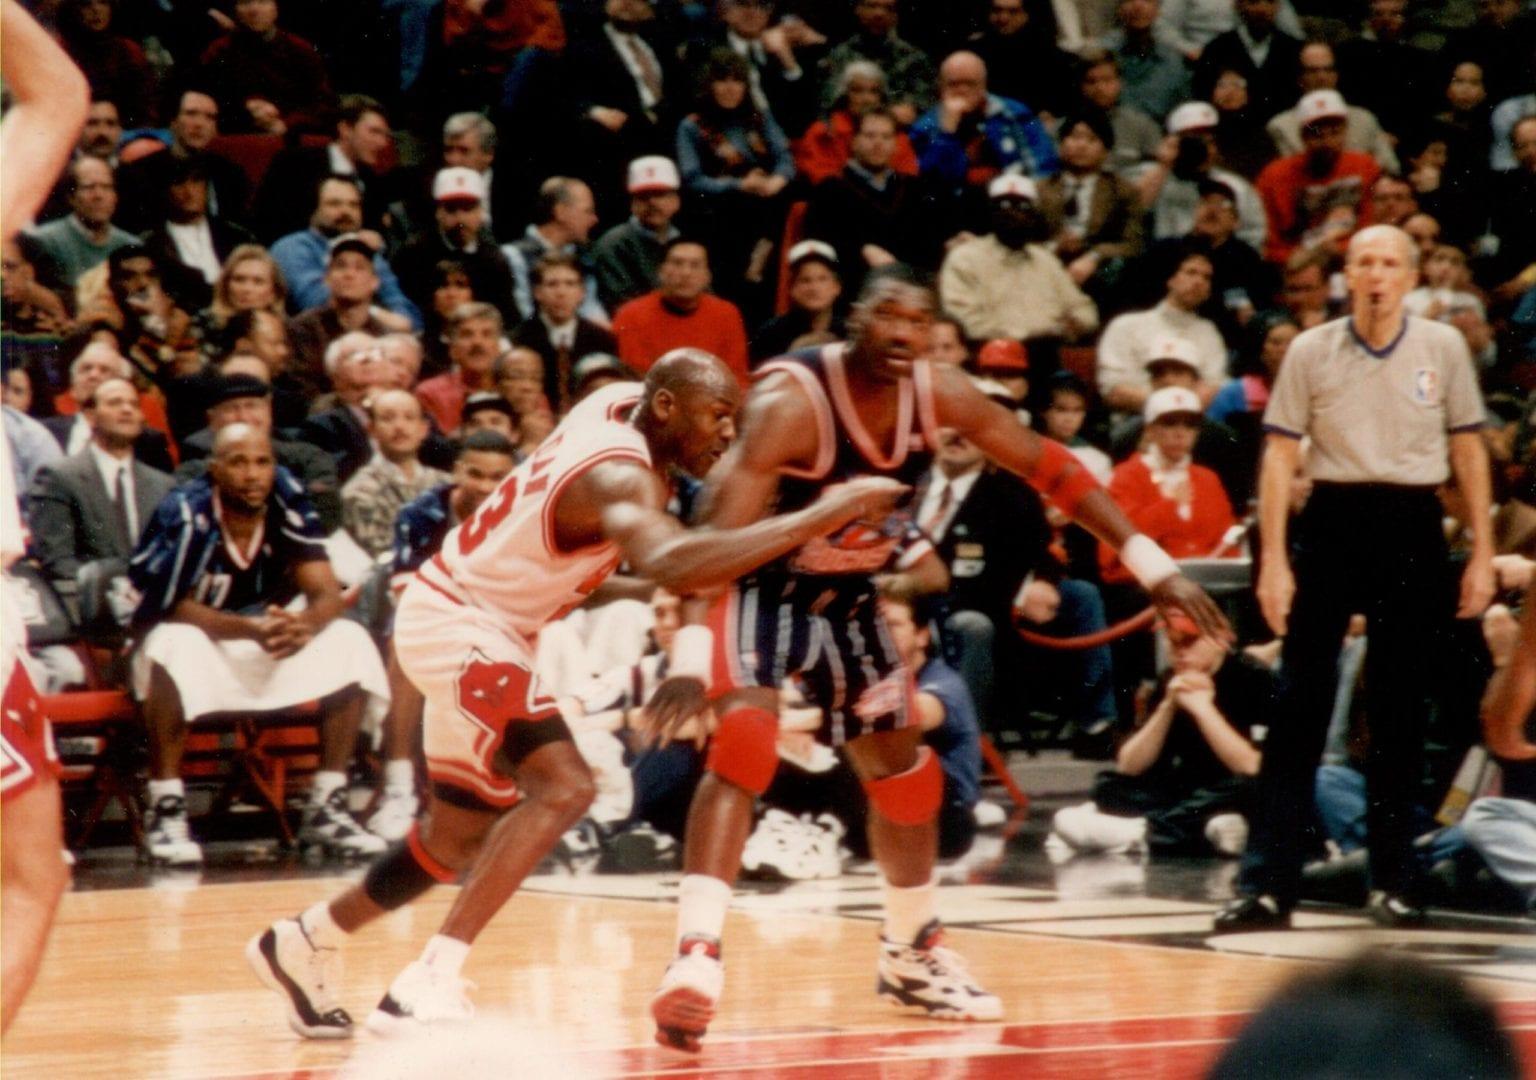 MJ guarding Hakeem Olajuwon